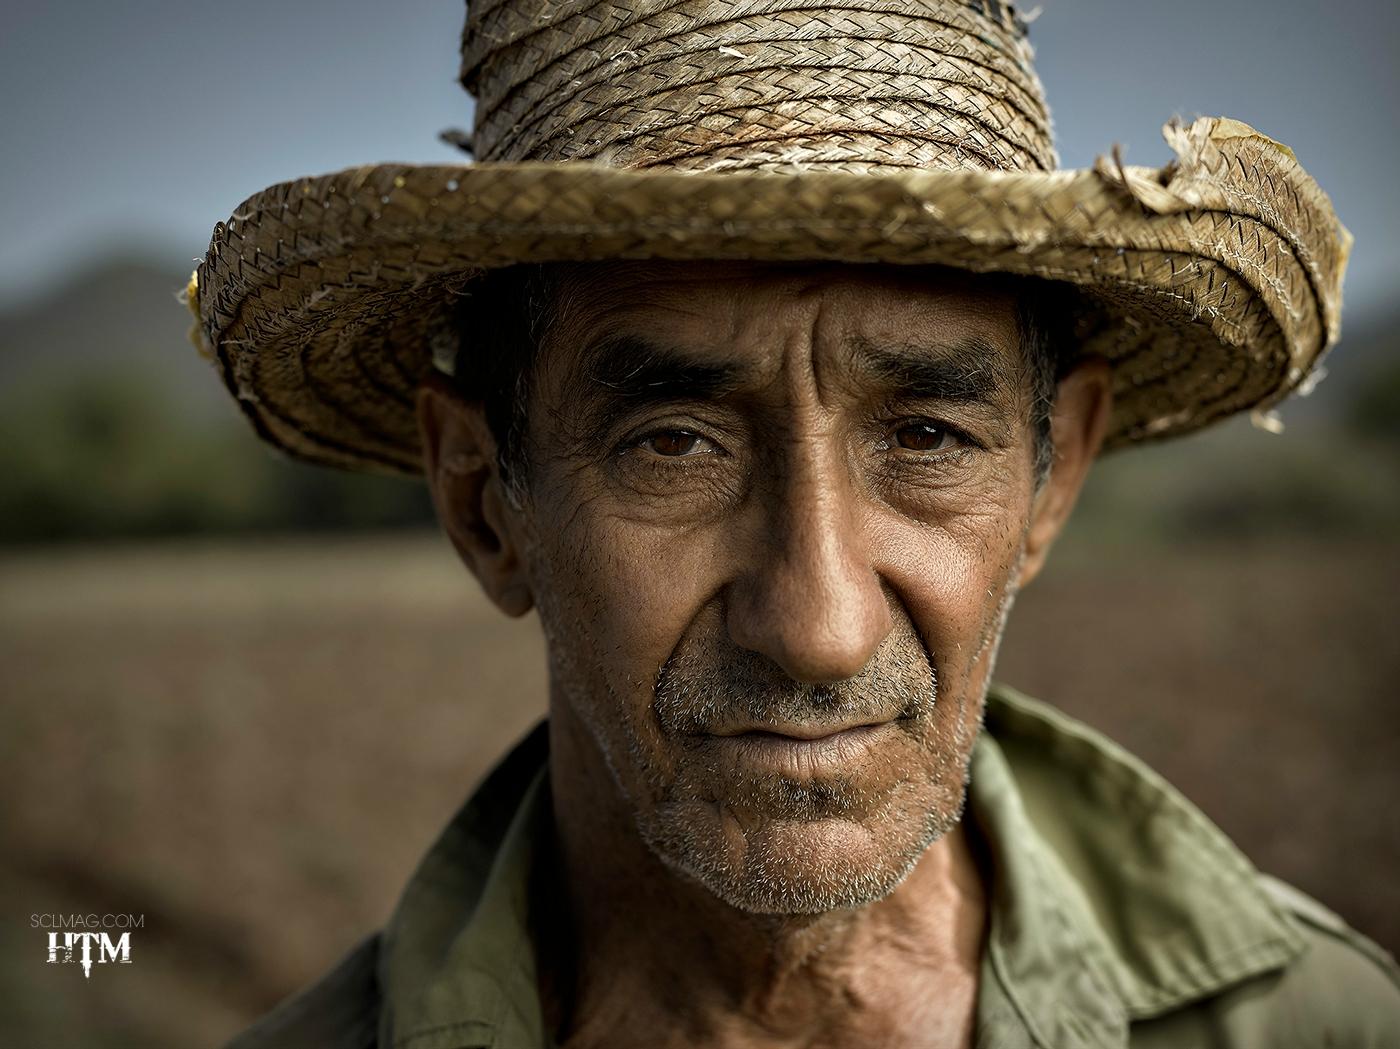 People_of_Cuba_14